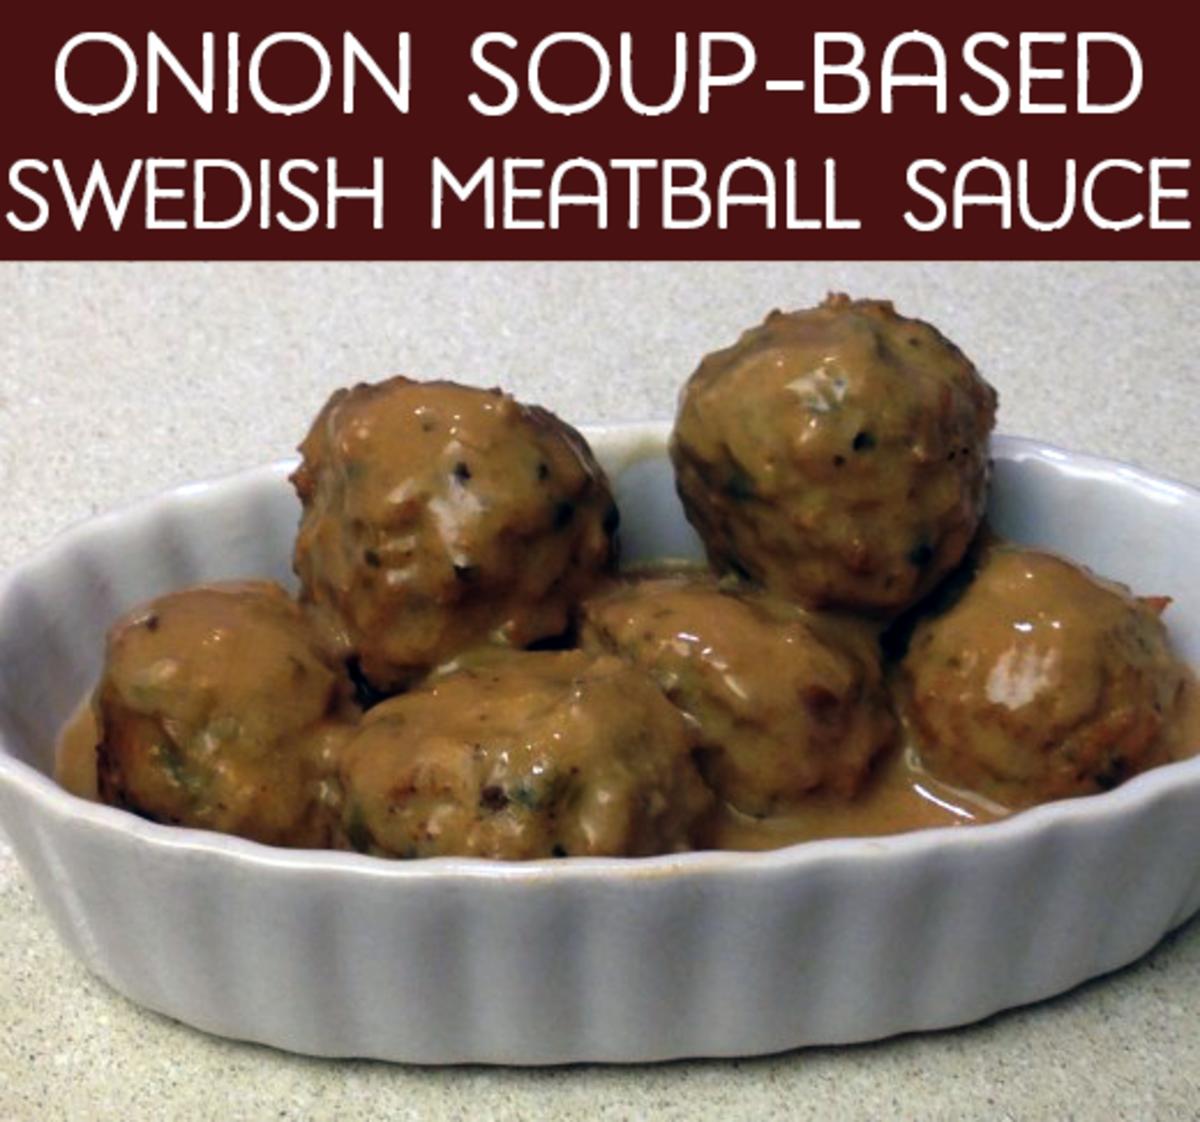 Onion Soup-Based Swedish Meatball Sauce